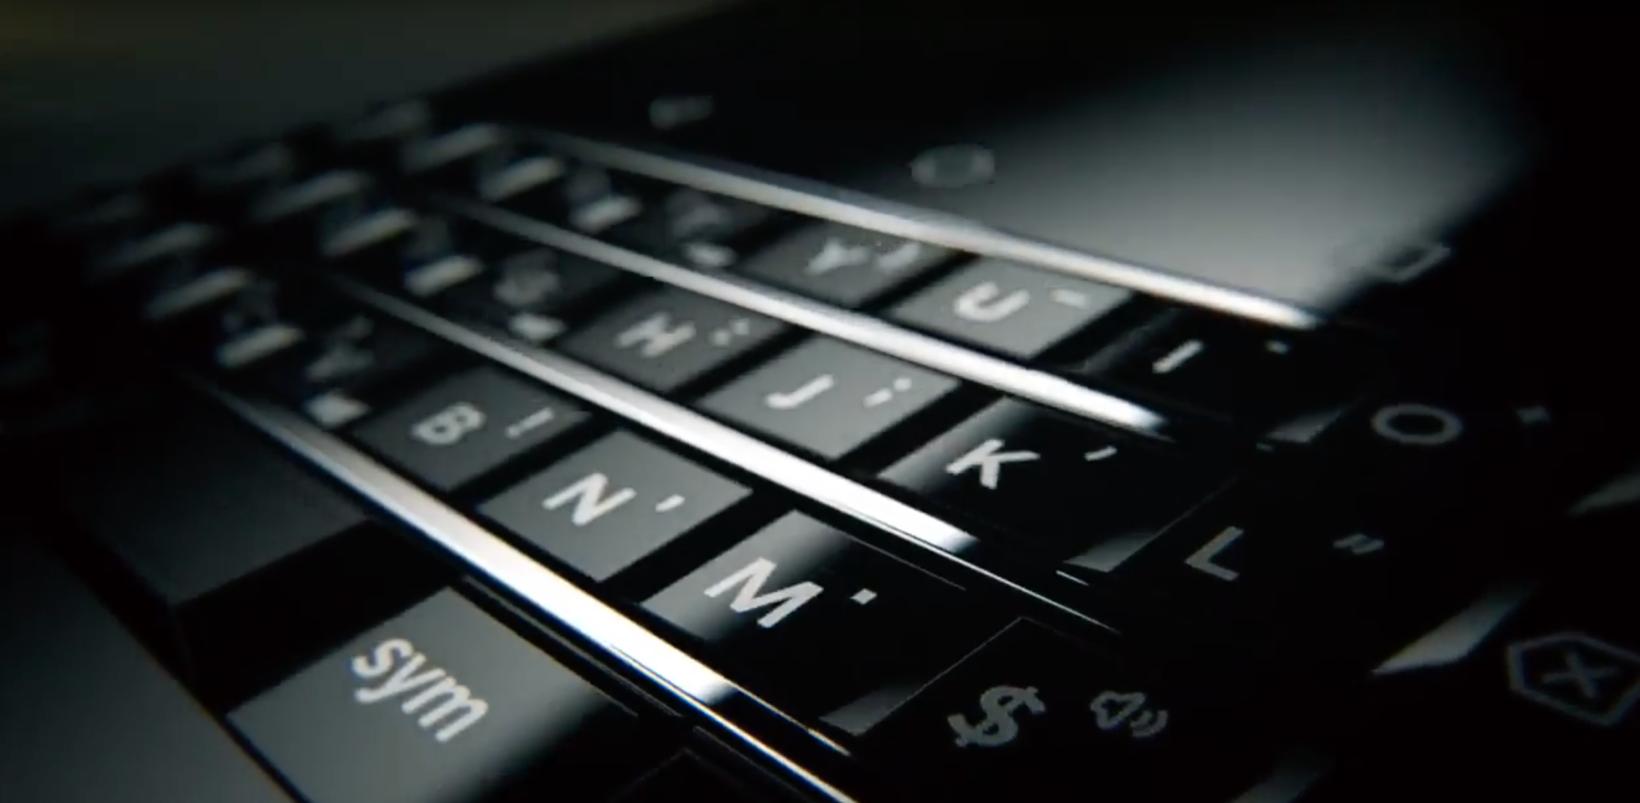 blackberry, tlc, smartphone